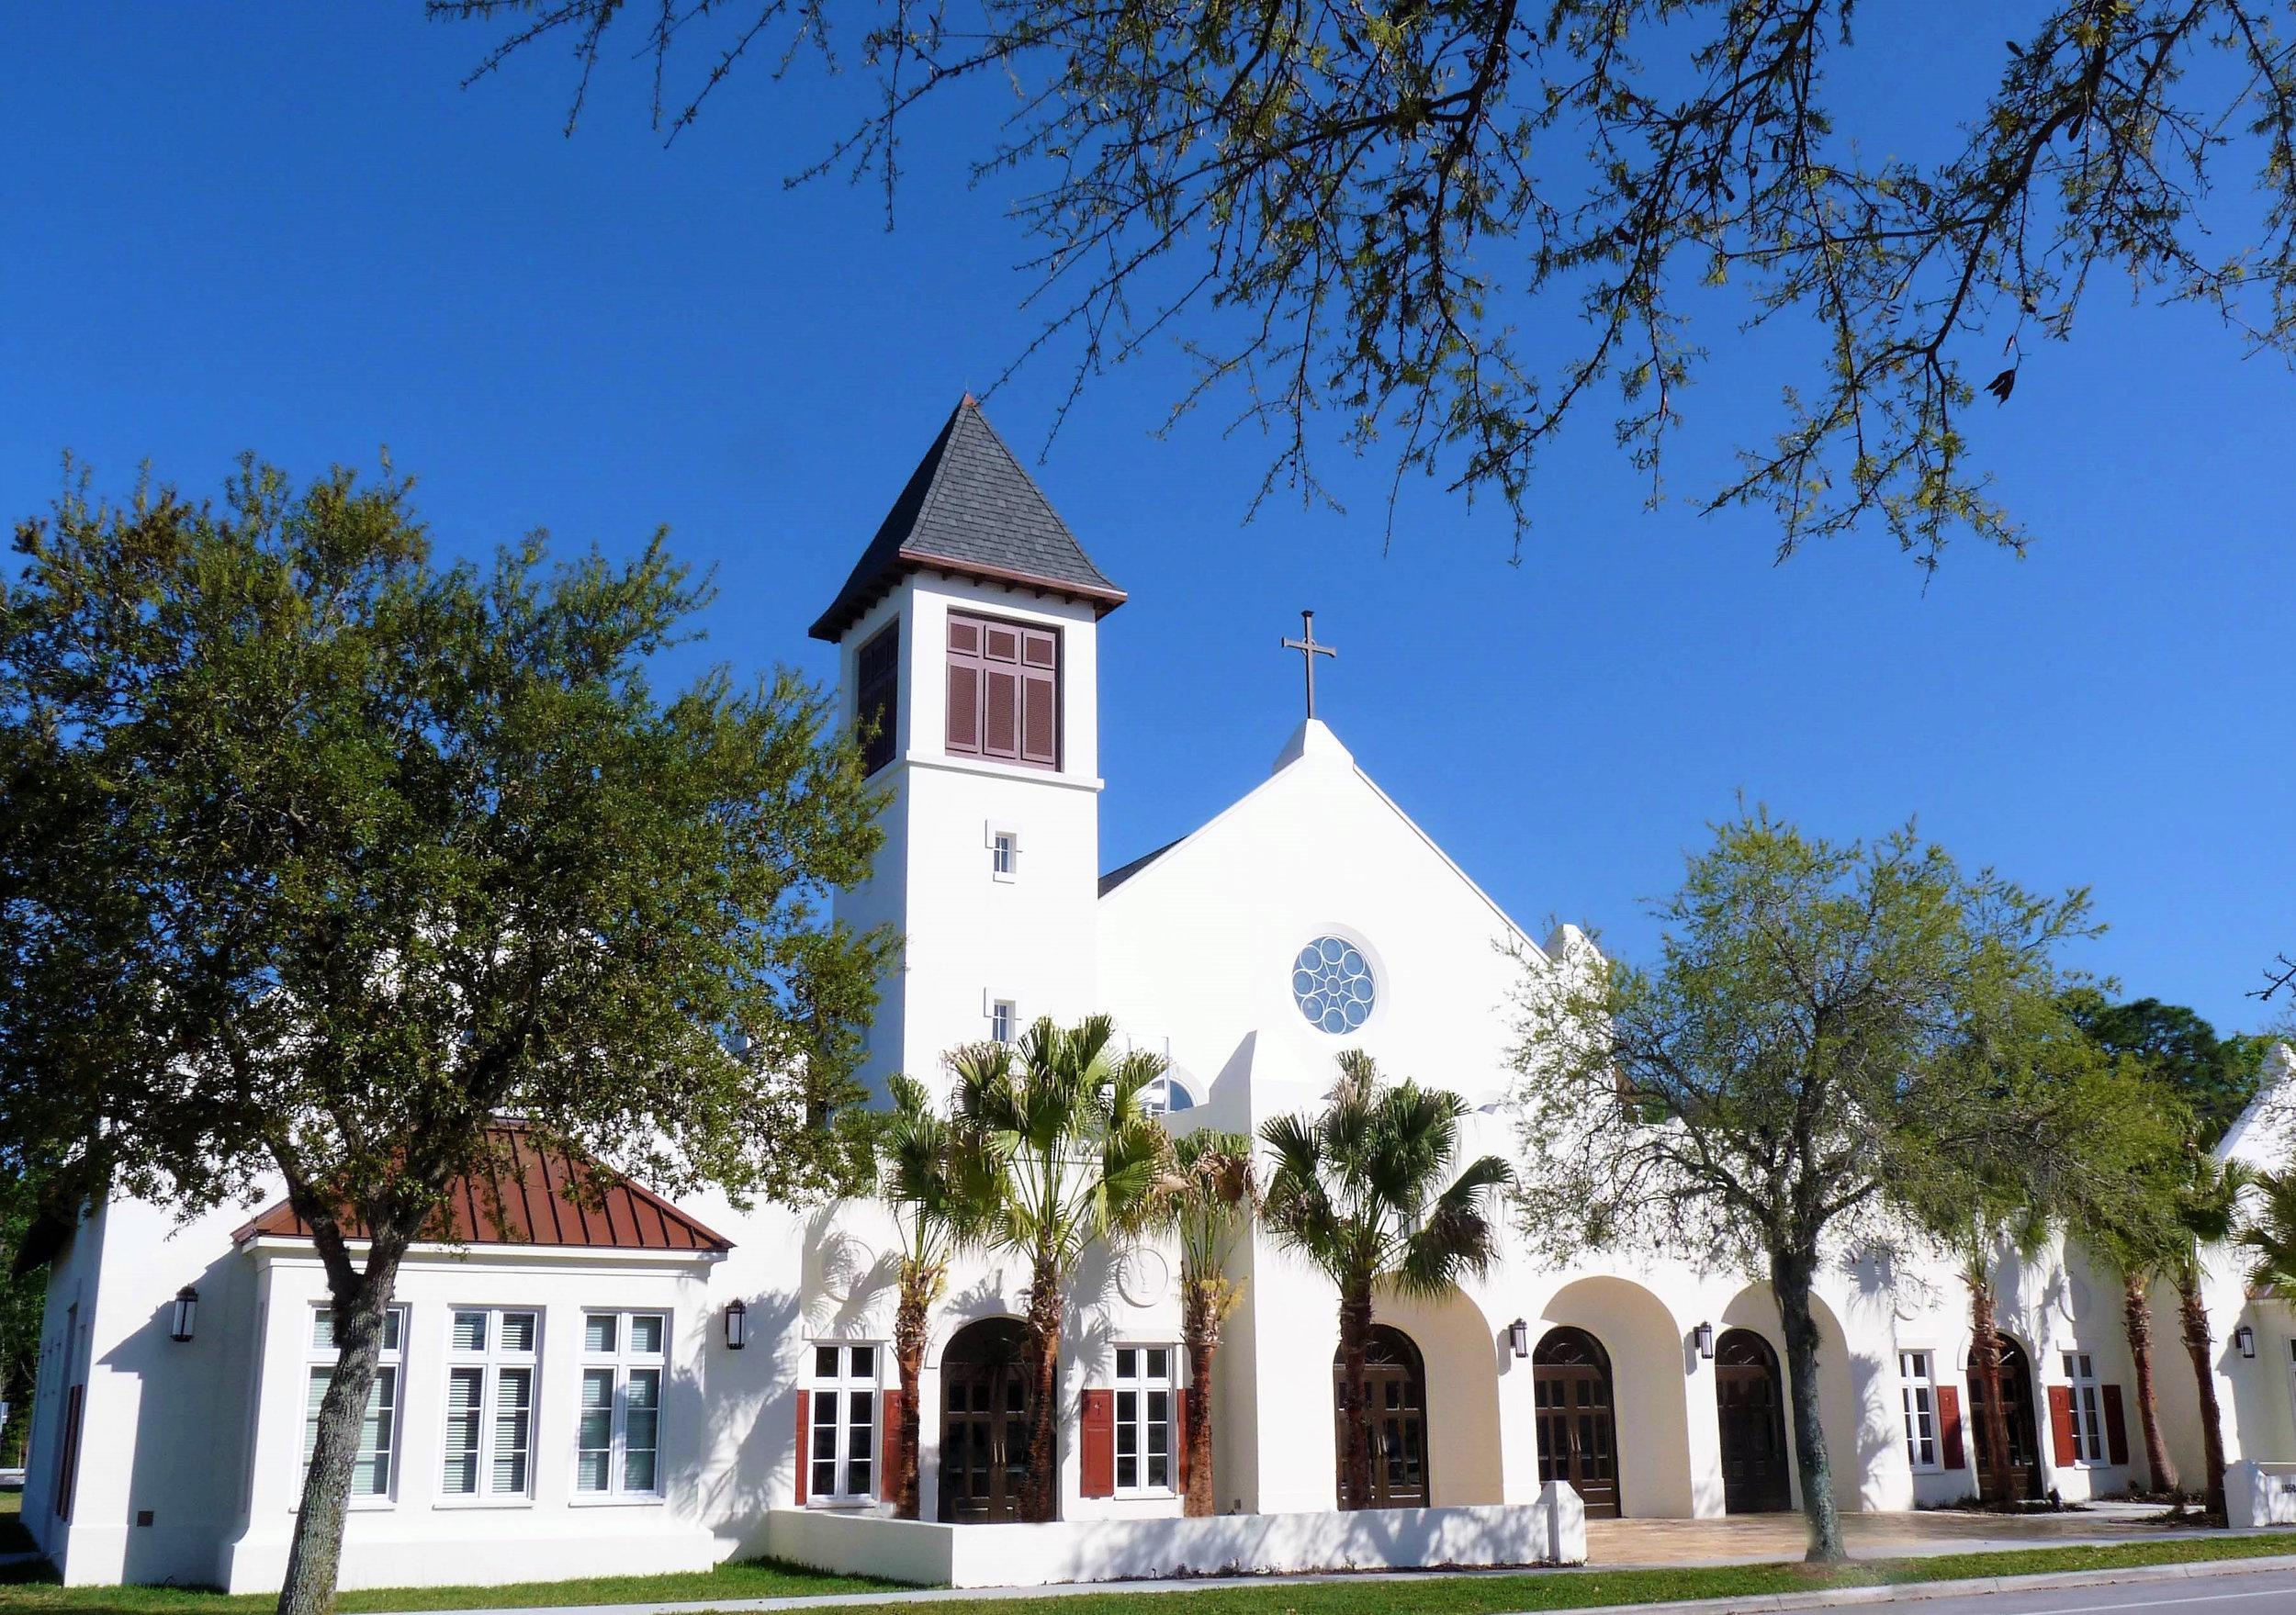 corpus christi church front angle med res.jpg